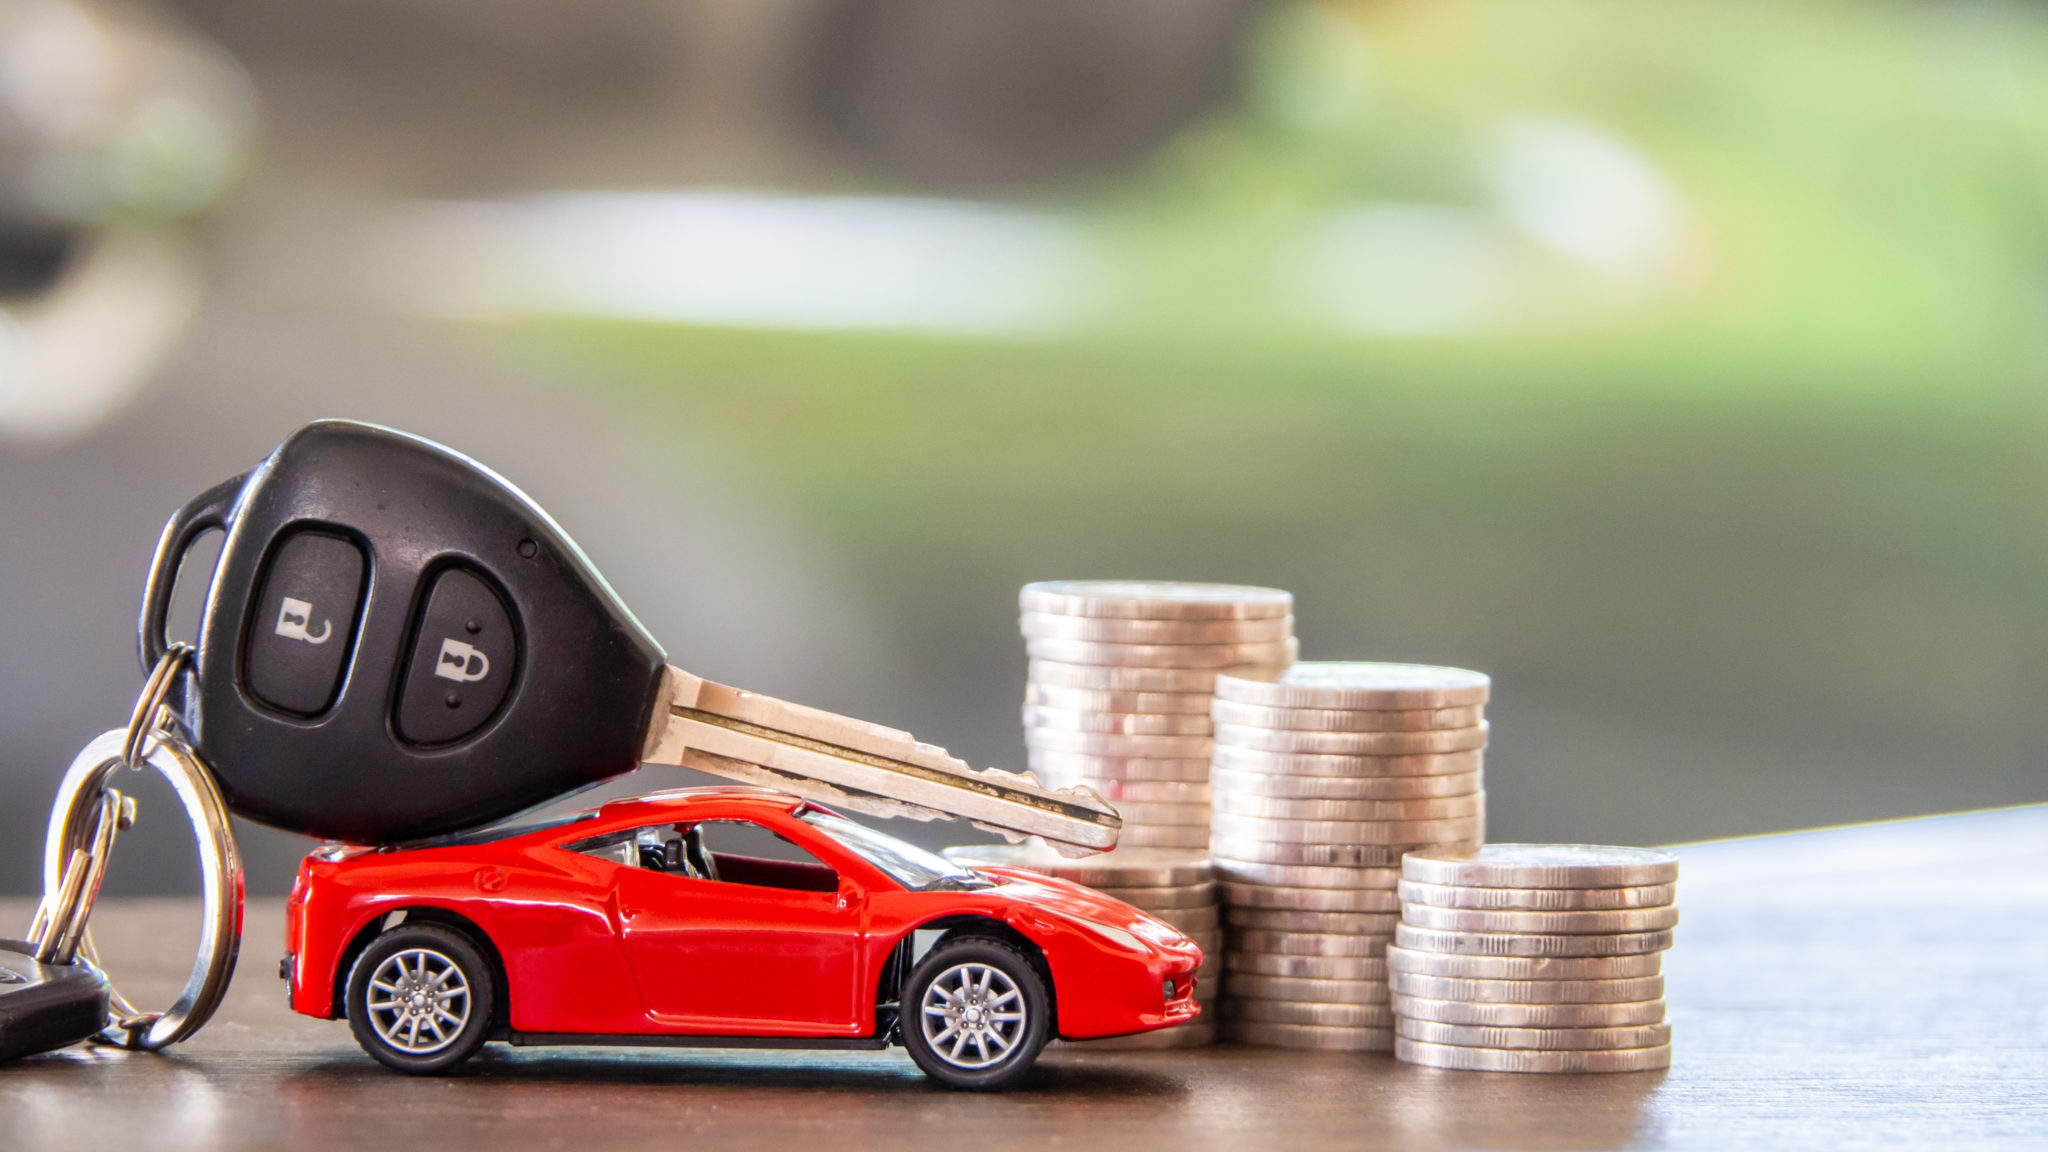 быстрый кредит под залог автомобиля мастер займ